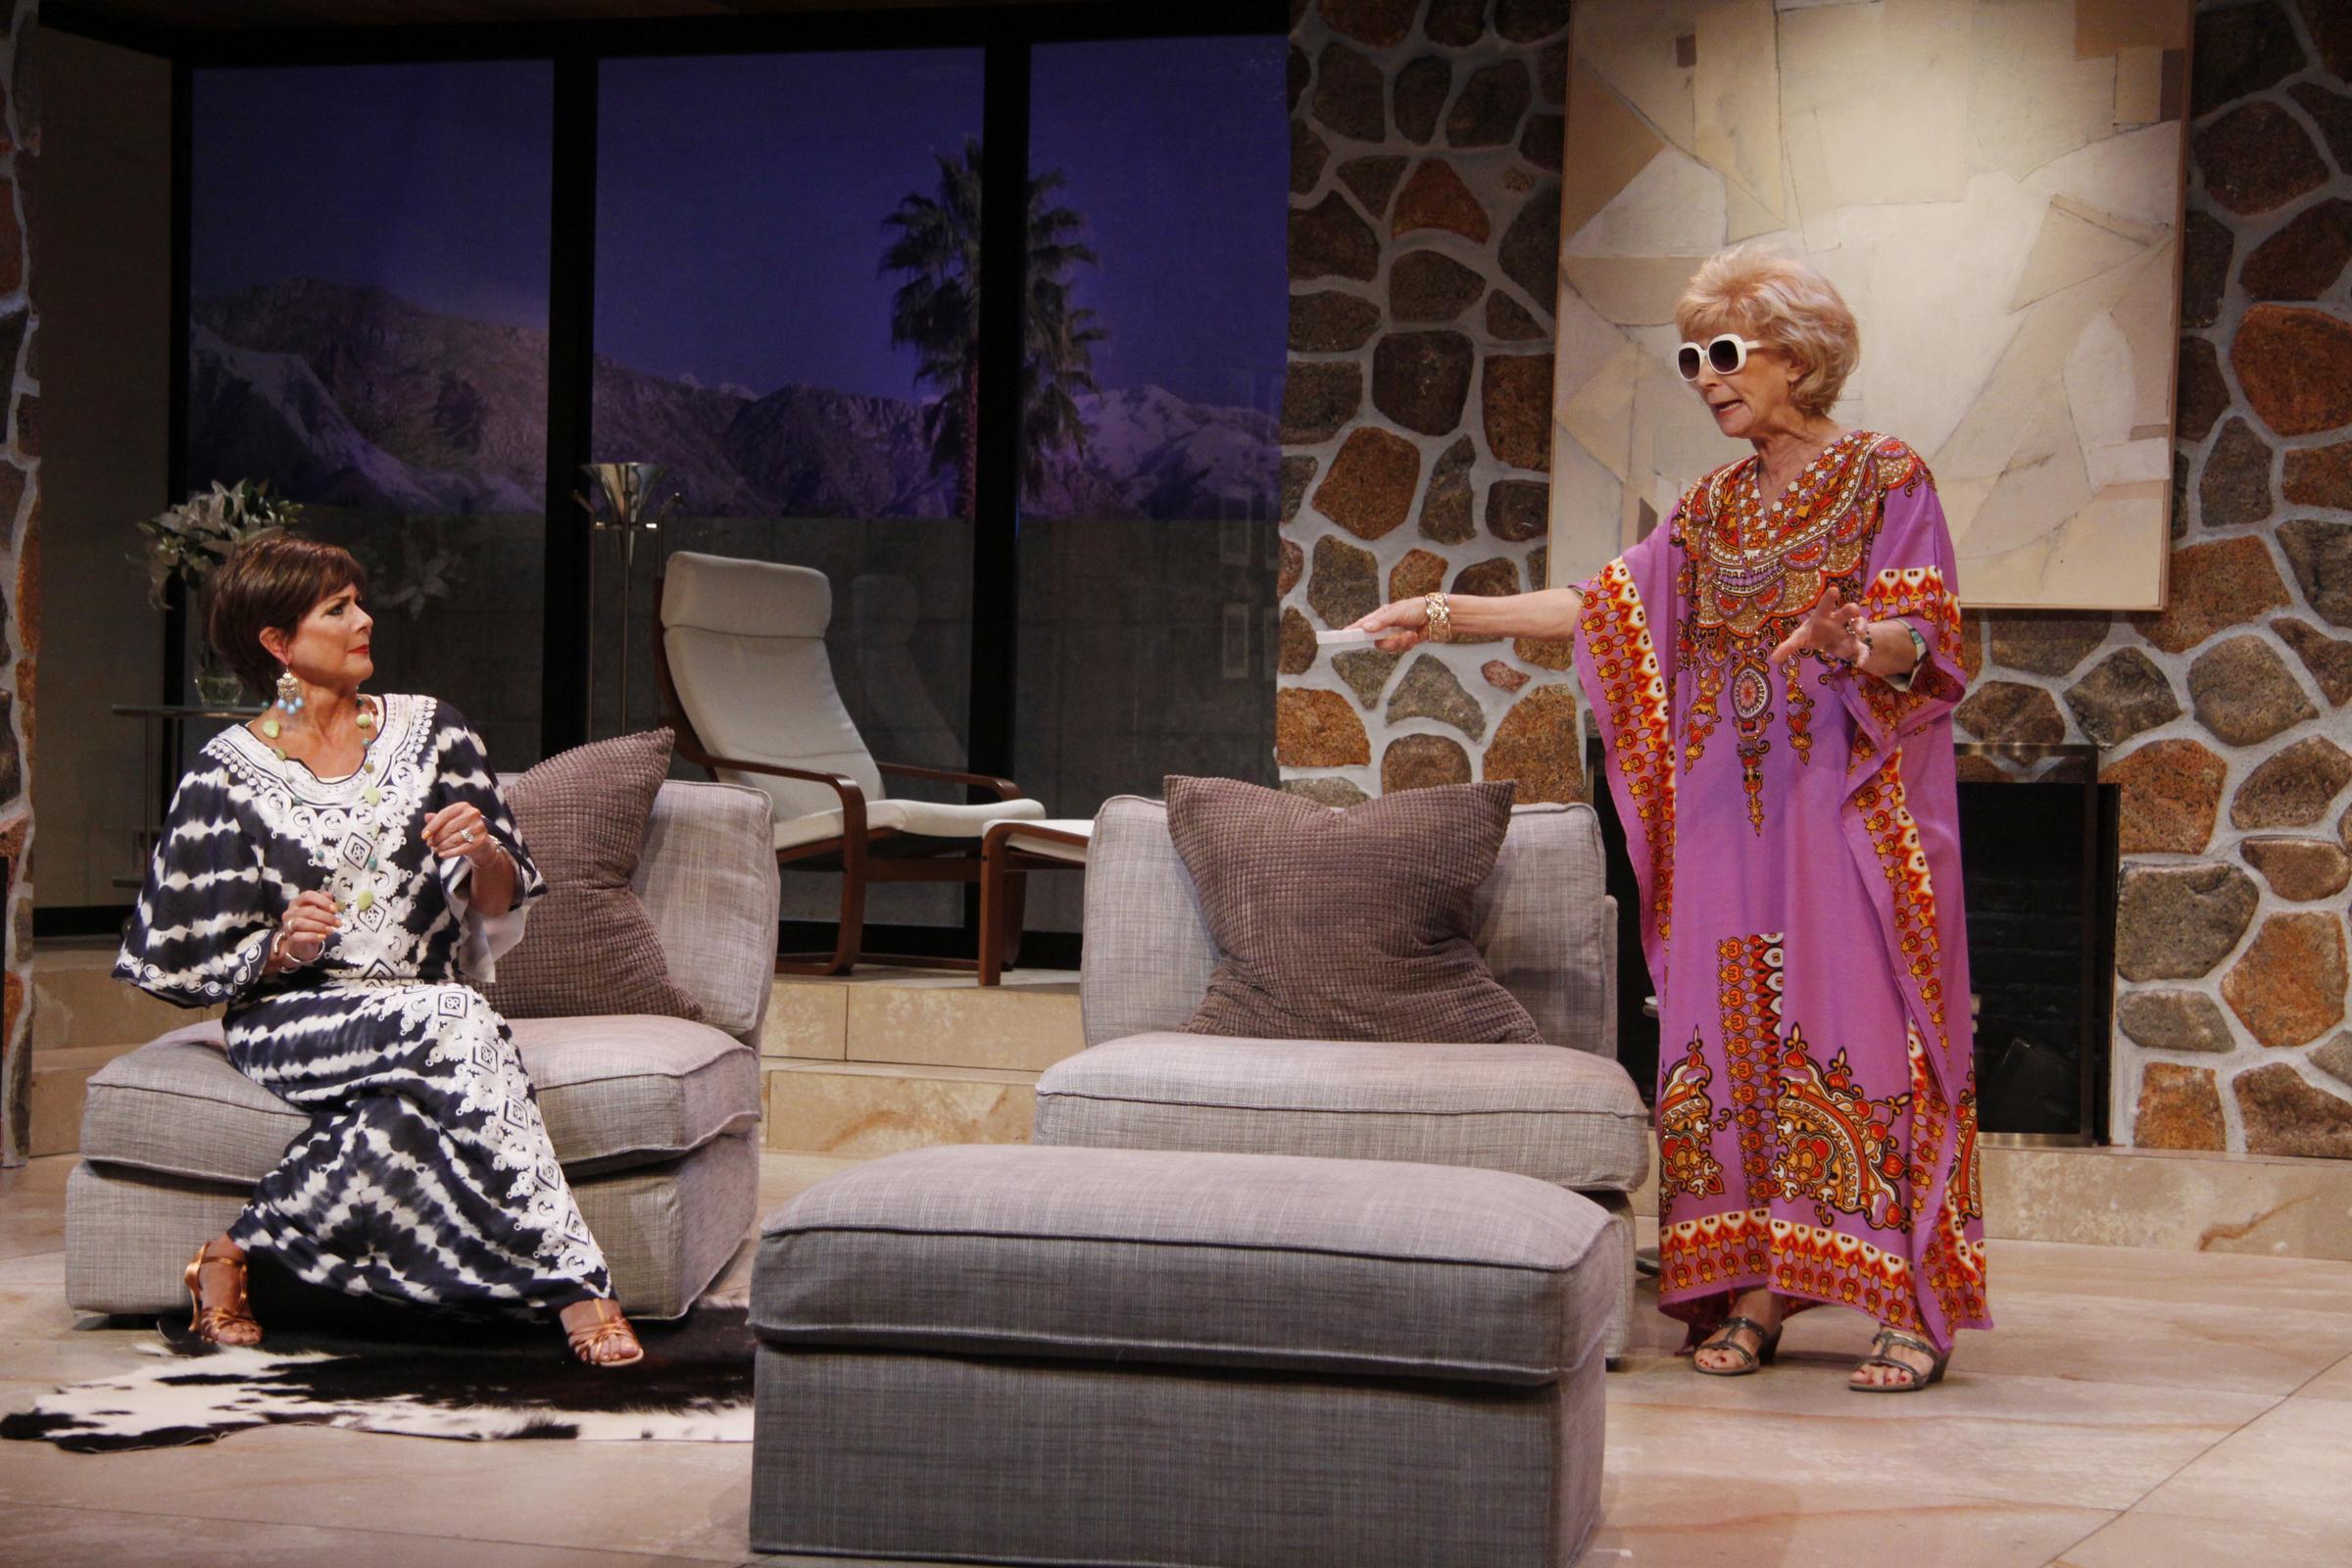 Top photo: left COLLEEN ZENK as Polly, PEGGY J SCOTT as Silda /photo credit: SUE COFLIN/MAX PHOTOS